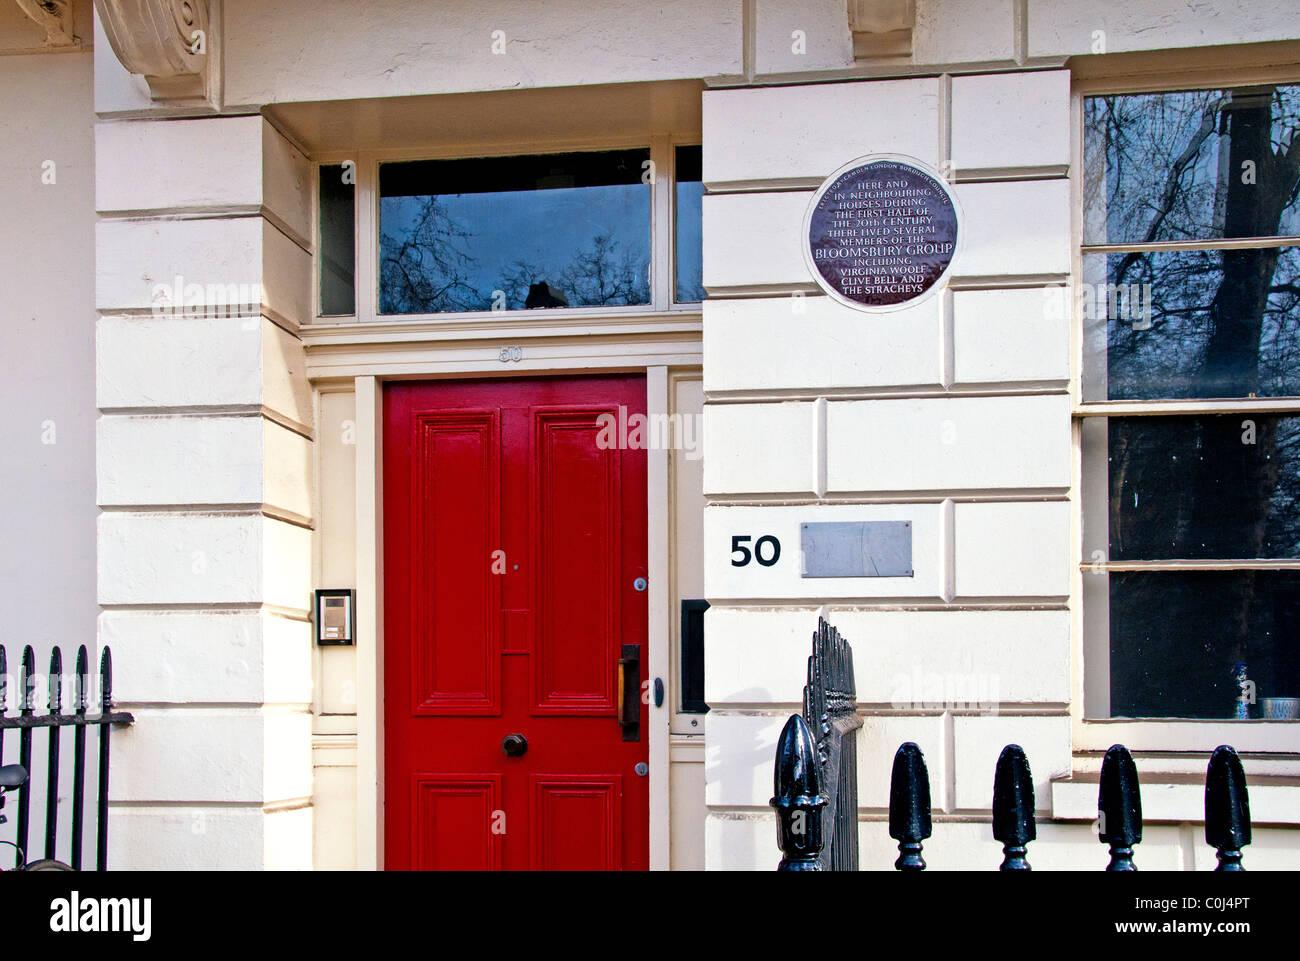 Maisons à Bloomsbury, Londres; Haus dans Bloomsbury, Gordon Square, Bloomsbury Wohnhaus der Gruppe Banque D'Images